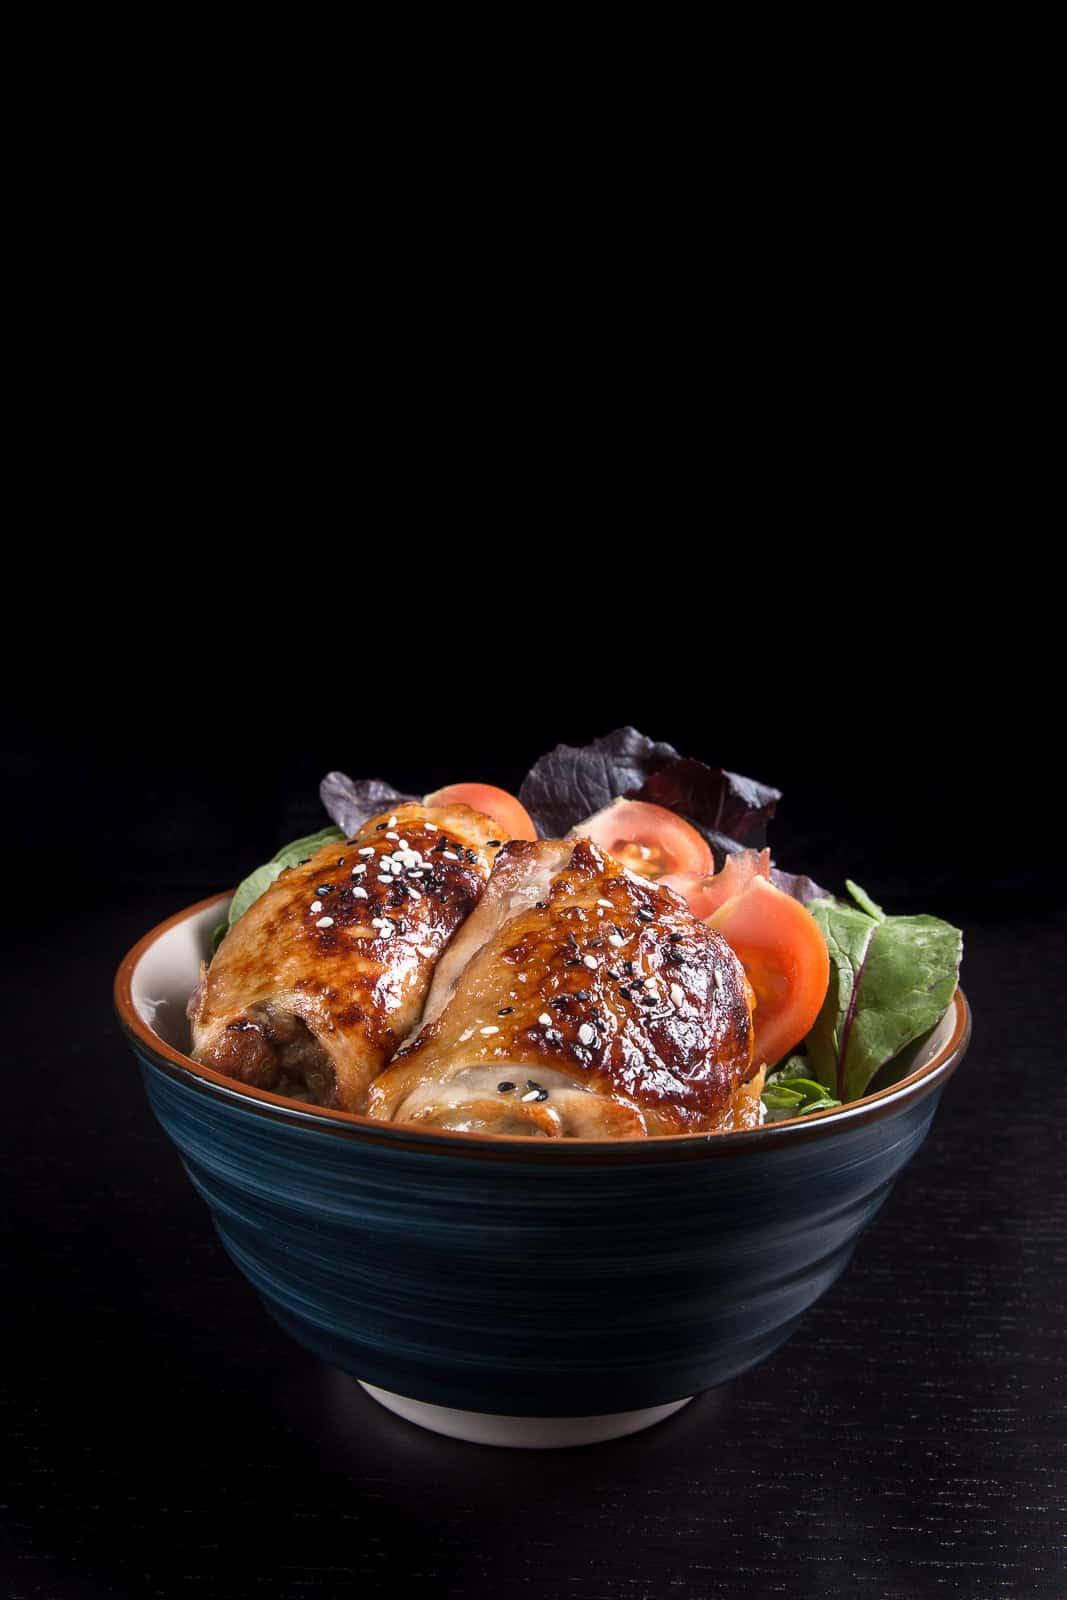 One Pot Pressure Cooker Teriyaki Chicken And Rice Recipe 1 Pressure Cook Recipes